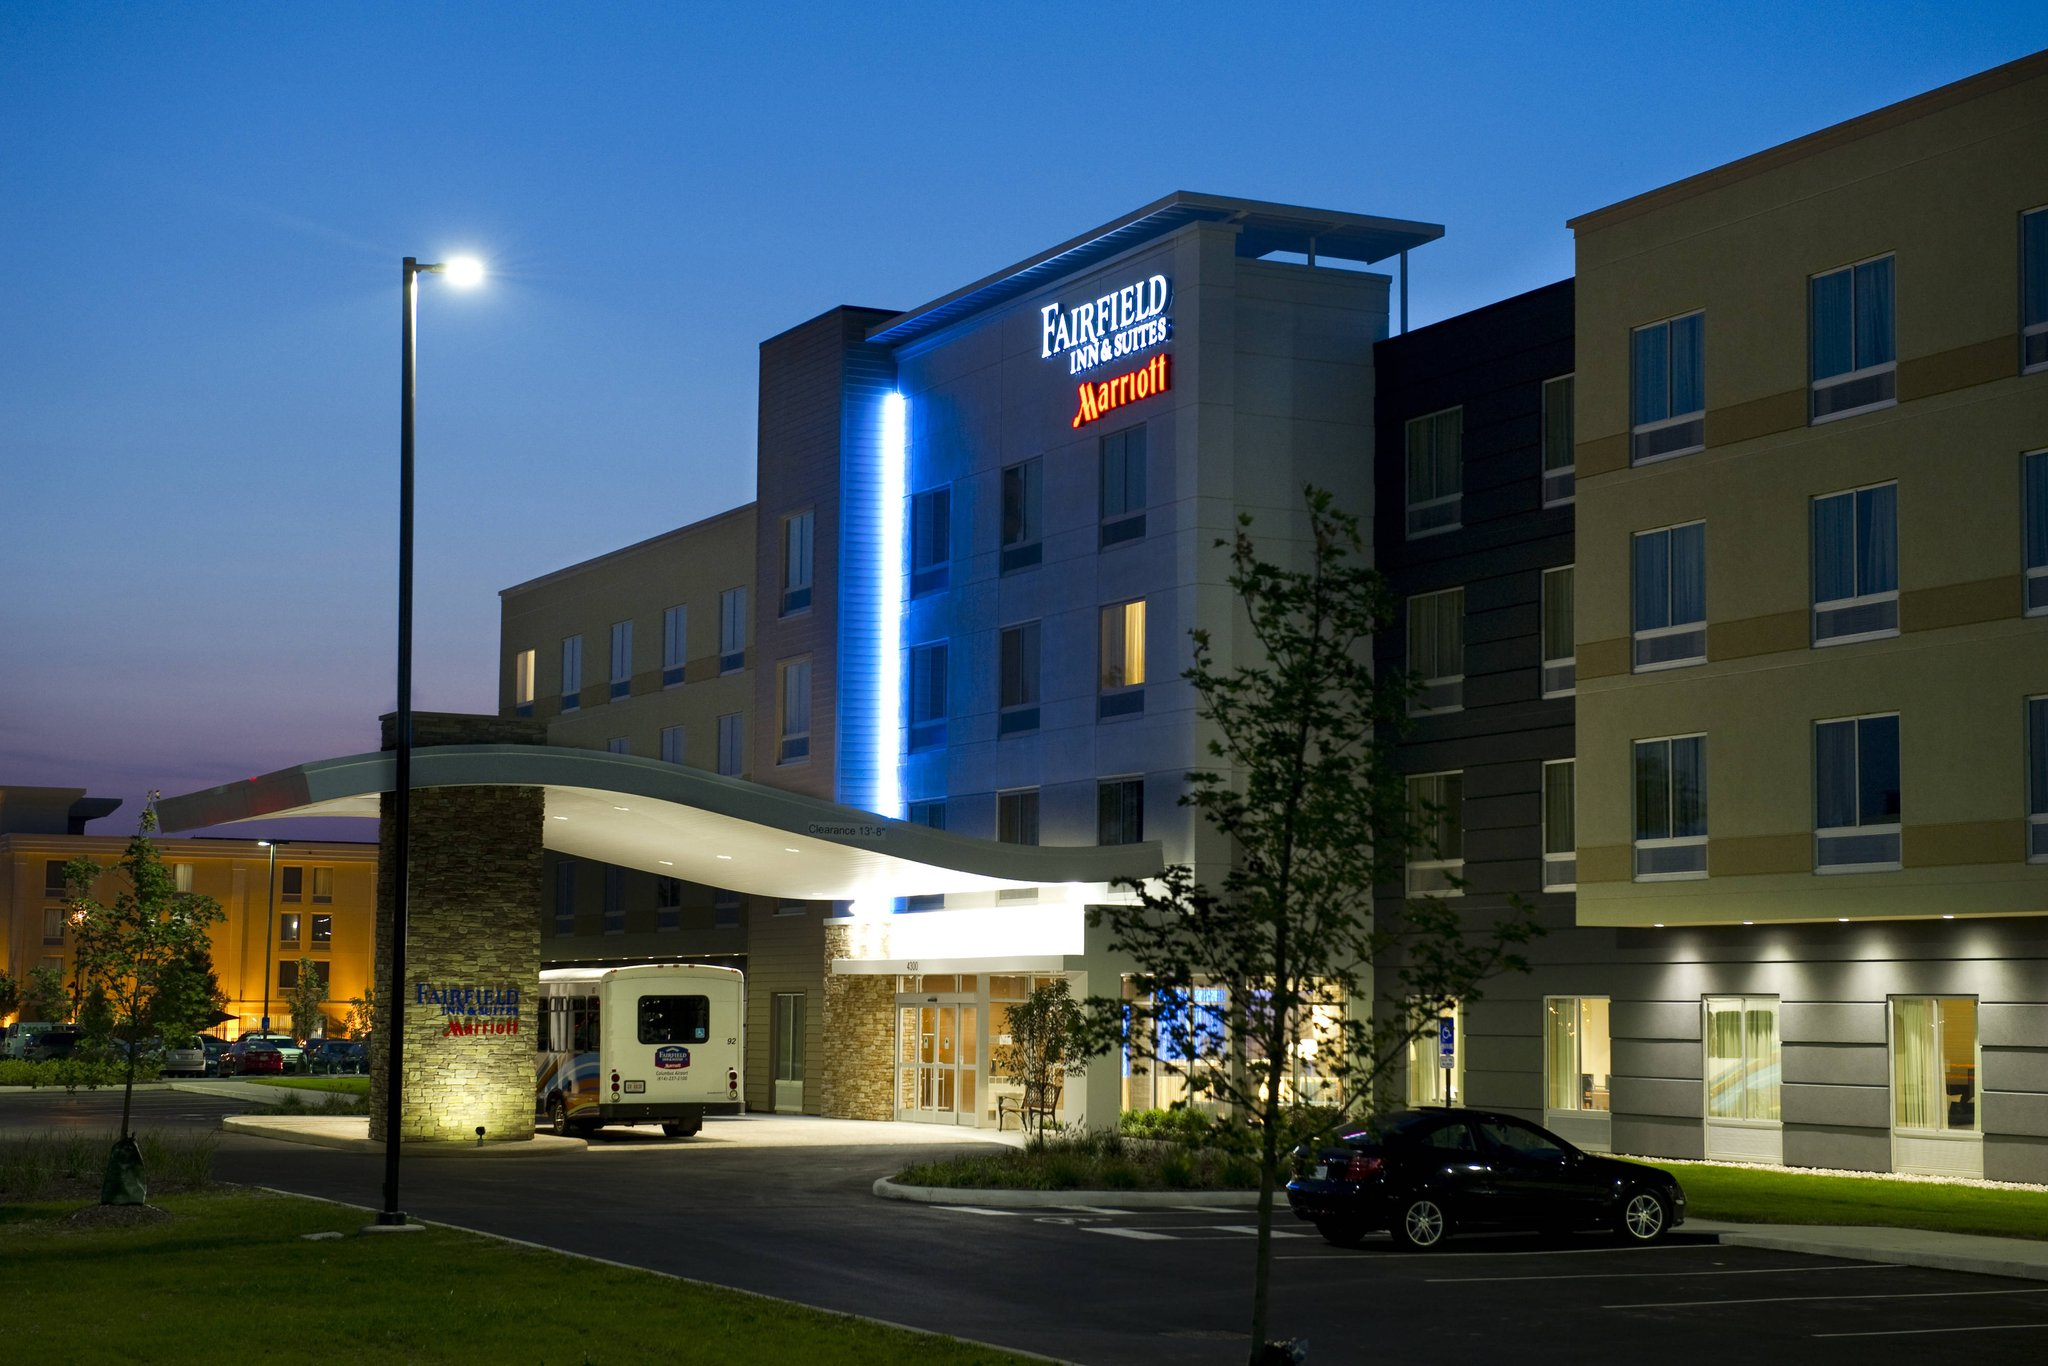 Fairfield Inn and Suites by Marrriott Columbus Airport